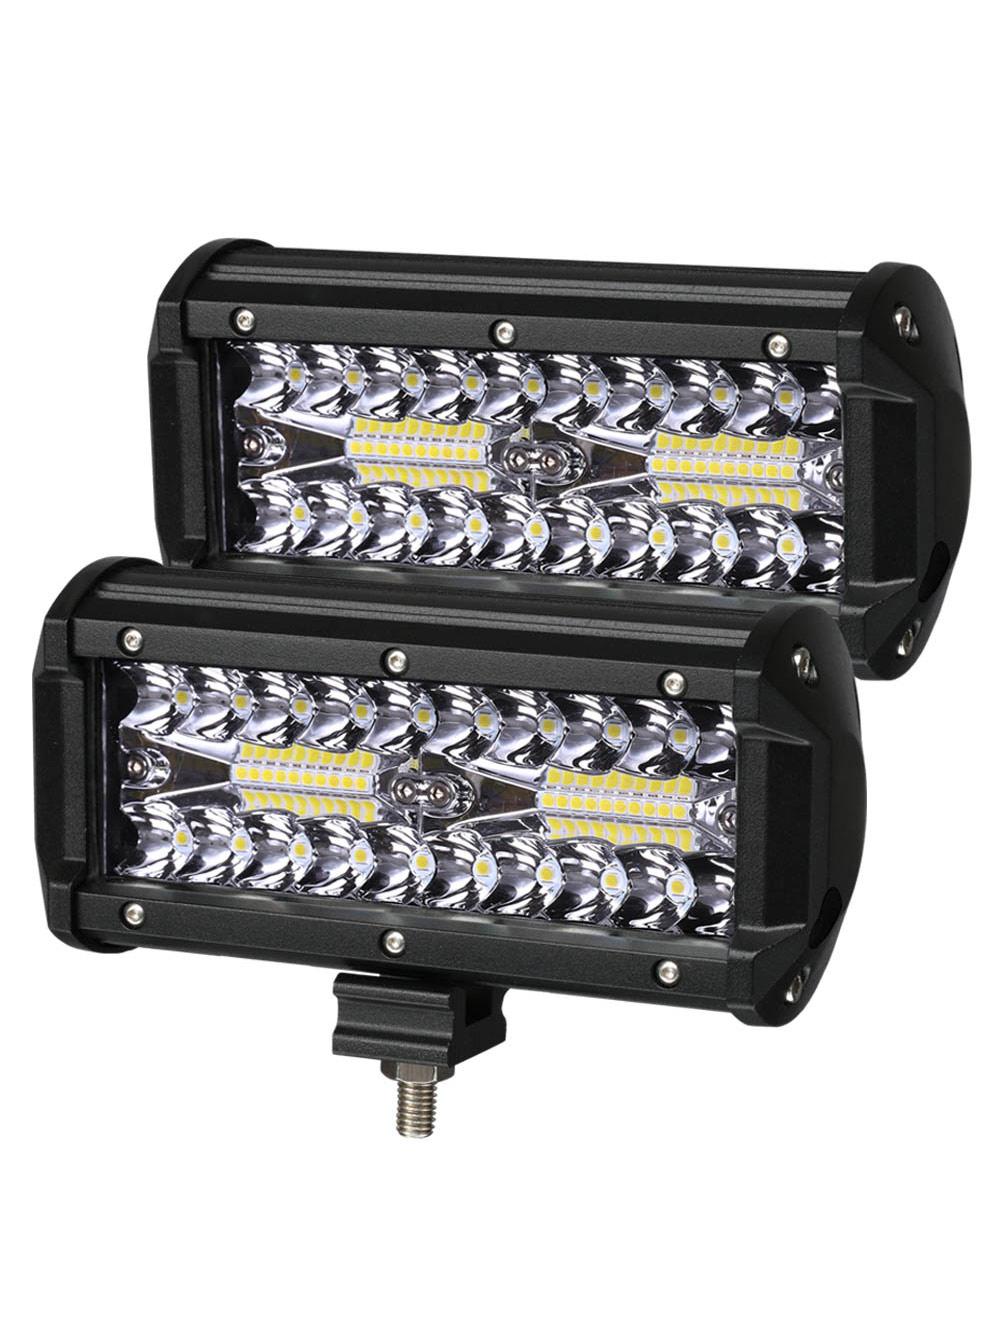 2PCS LED Bar 7 inch LED Light Bar  3 Rows Work Light Combo Beam for Driving Offroad Boat Car Tractor Truck 4x4 SUV 12V 24V